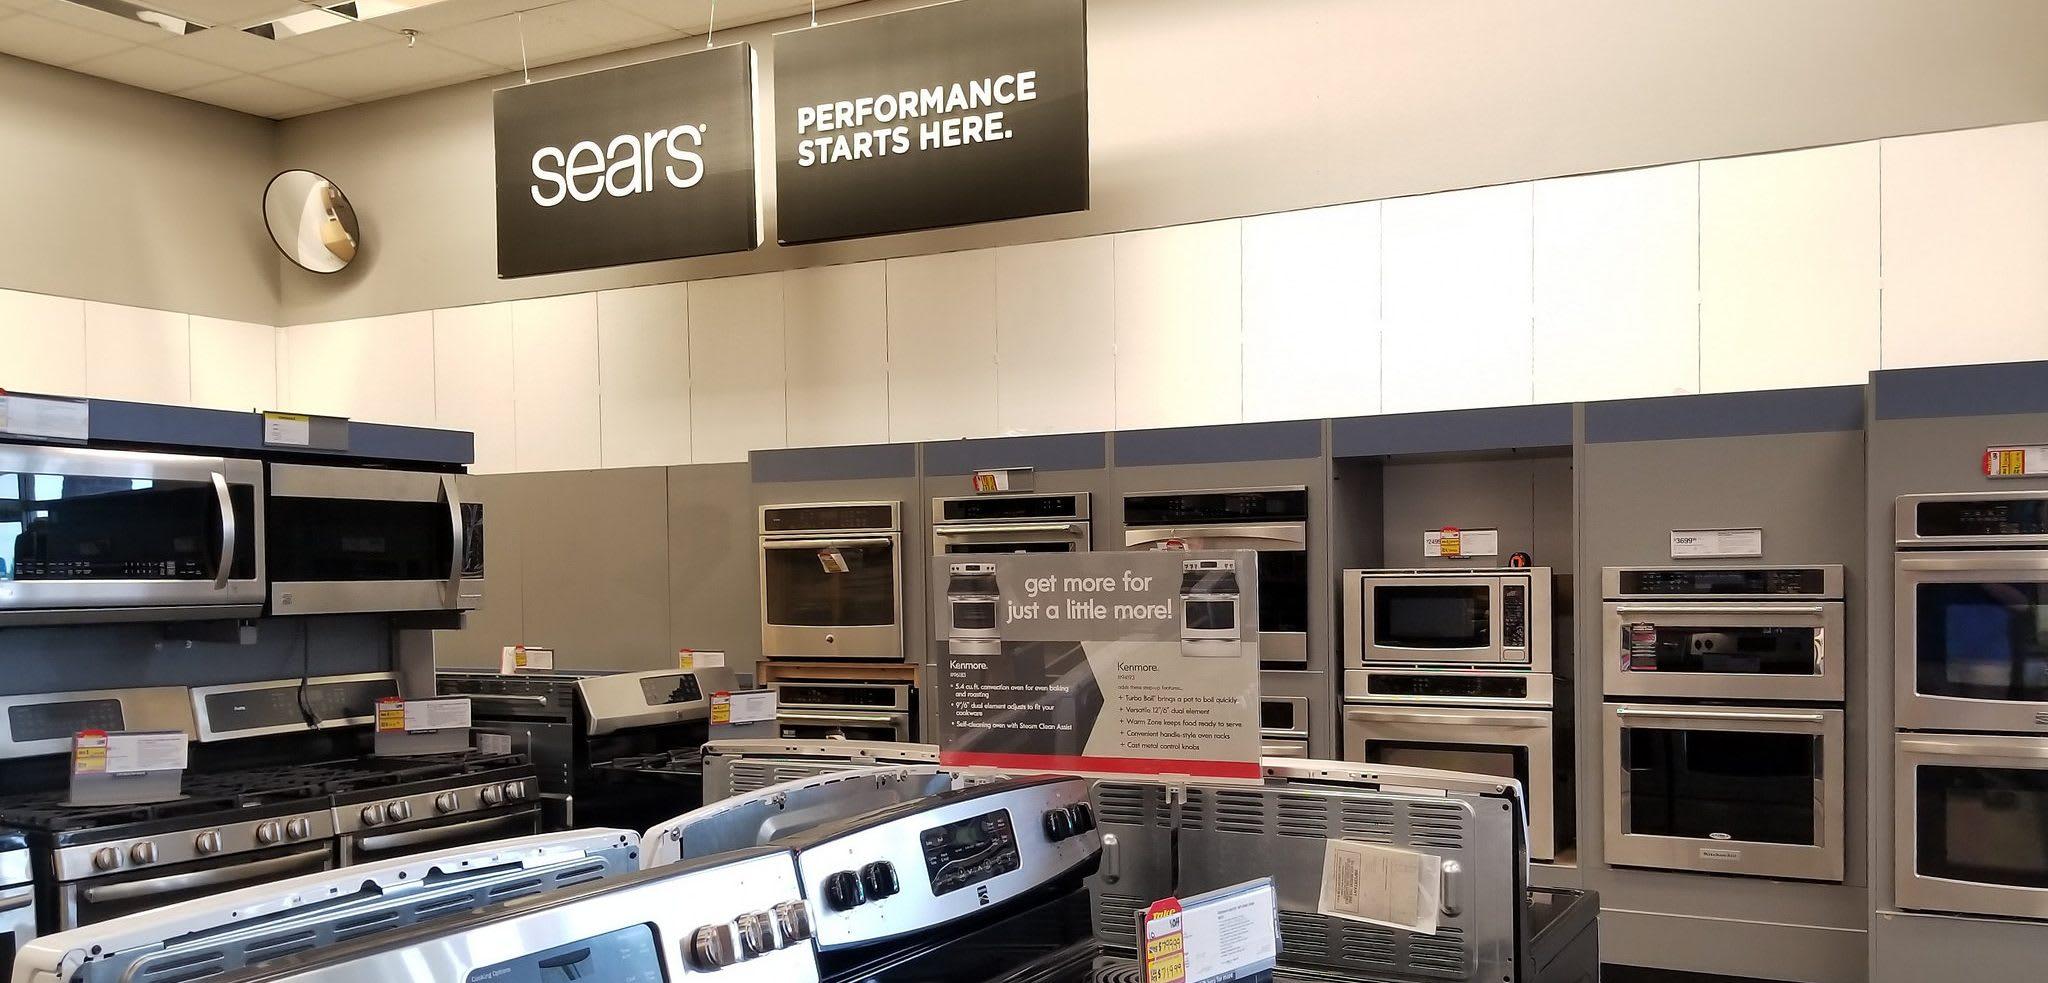 Sears Stops Selling Whirlpool Appliances Ending 100 Year